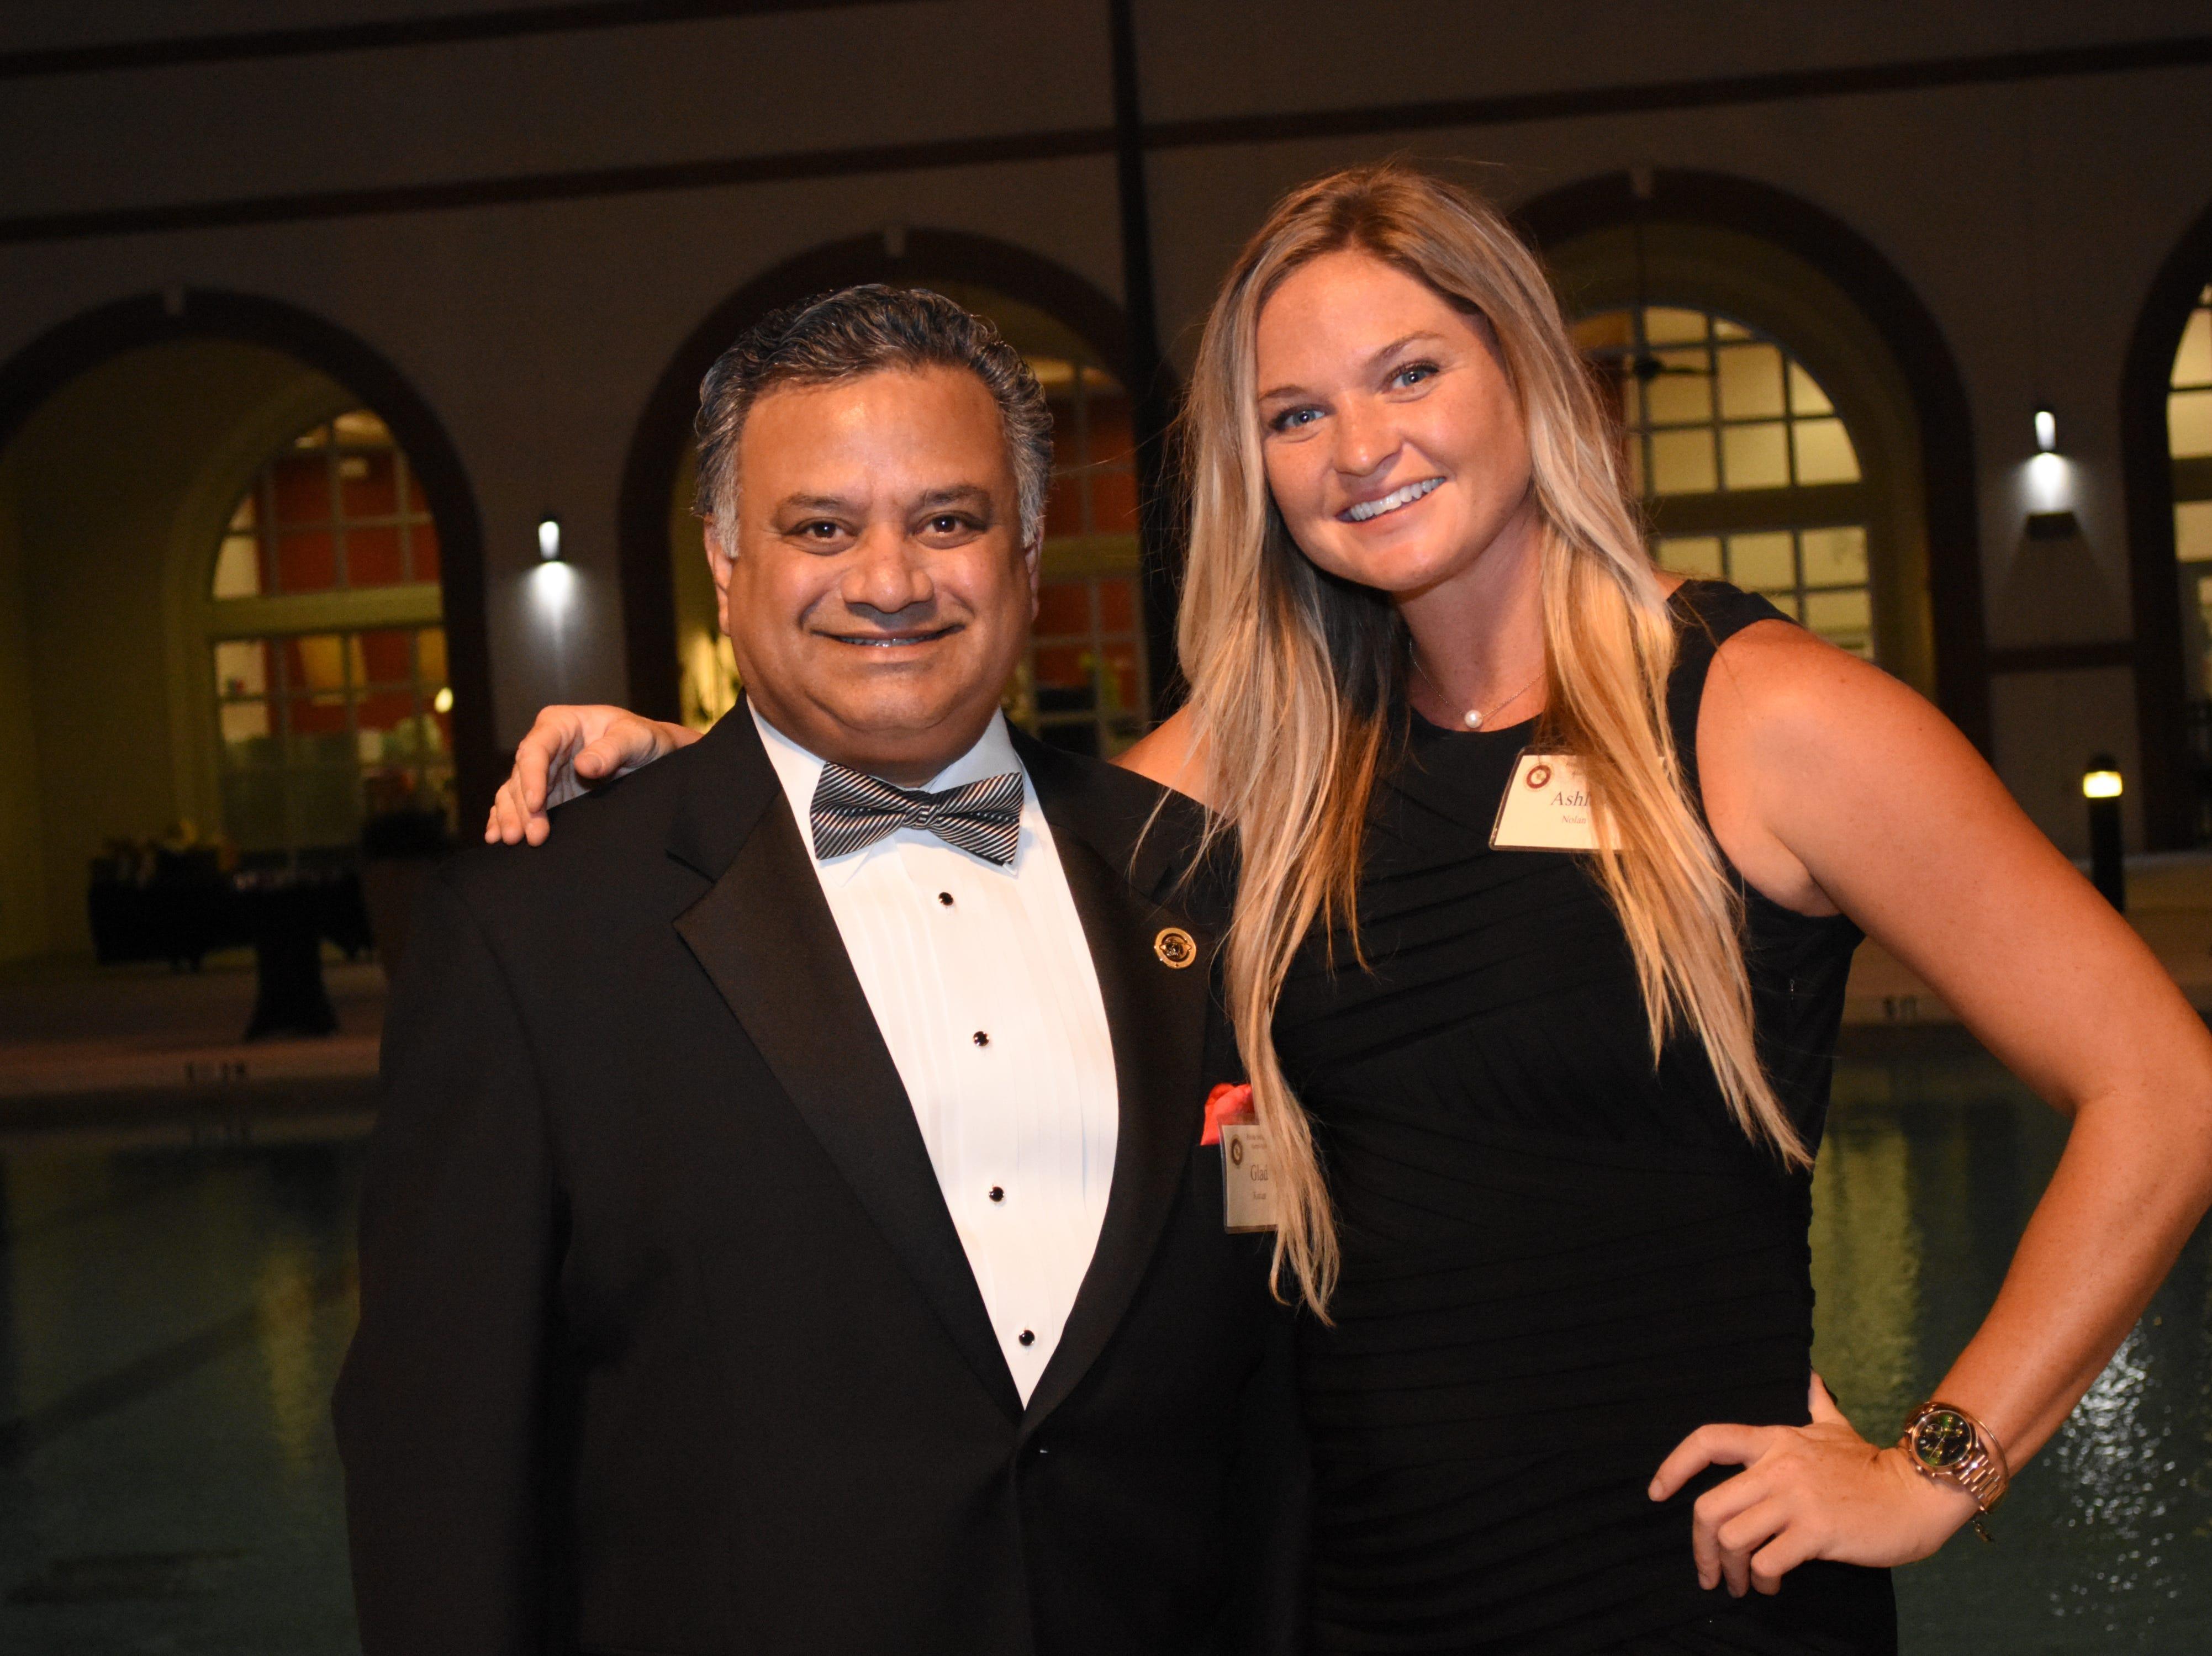 Glad Kurian and Ashley Nolan at Florida Tech's 60th Anniversary Homecoming Gala Oct. 13, 2018, at the Clemente Center.